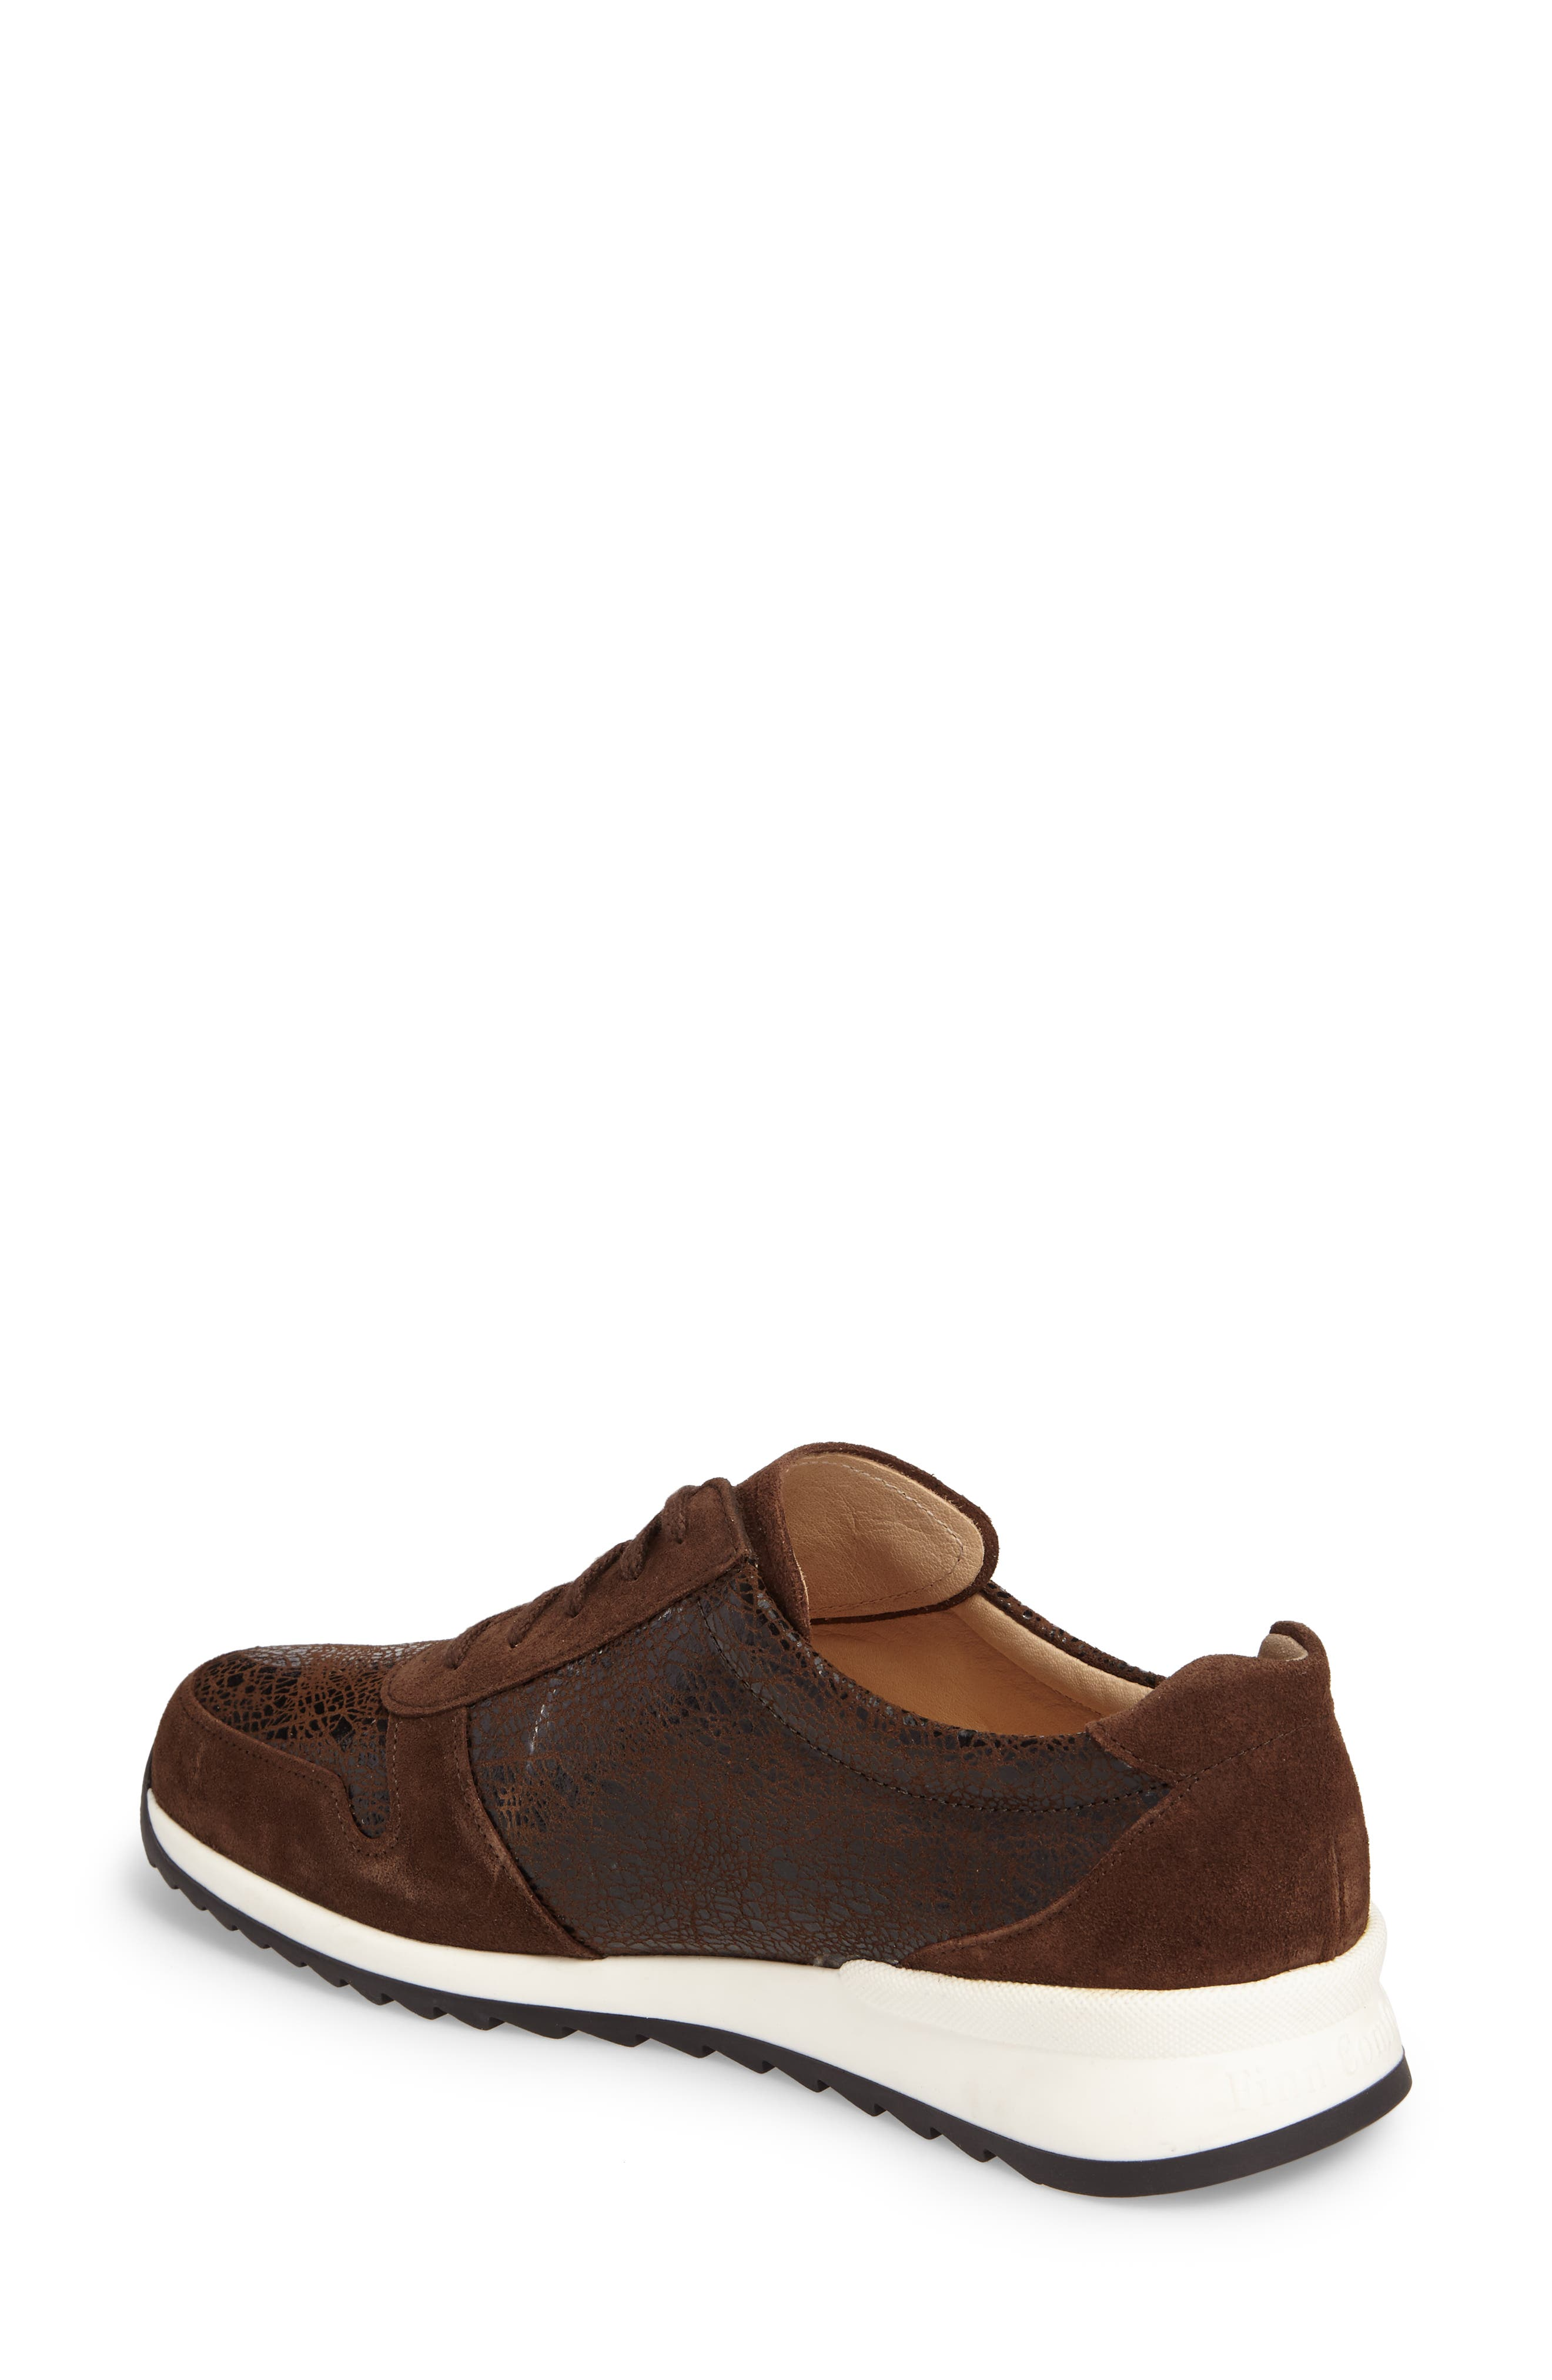 FINN COMFORT,                             Sidonia Sneaker,                             Alternate thumbnail 2, color,                             207